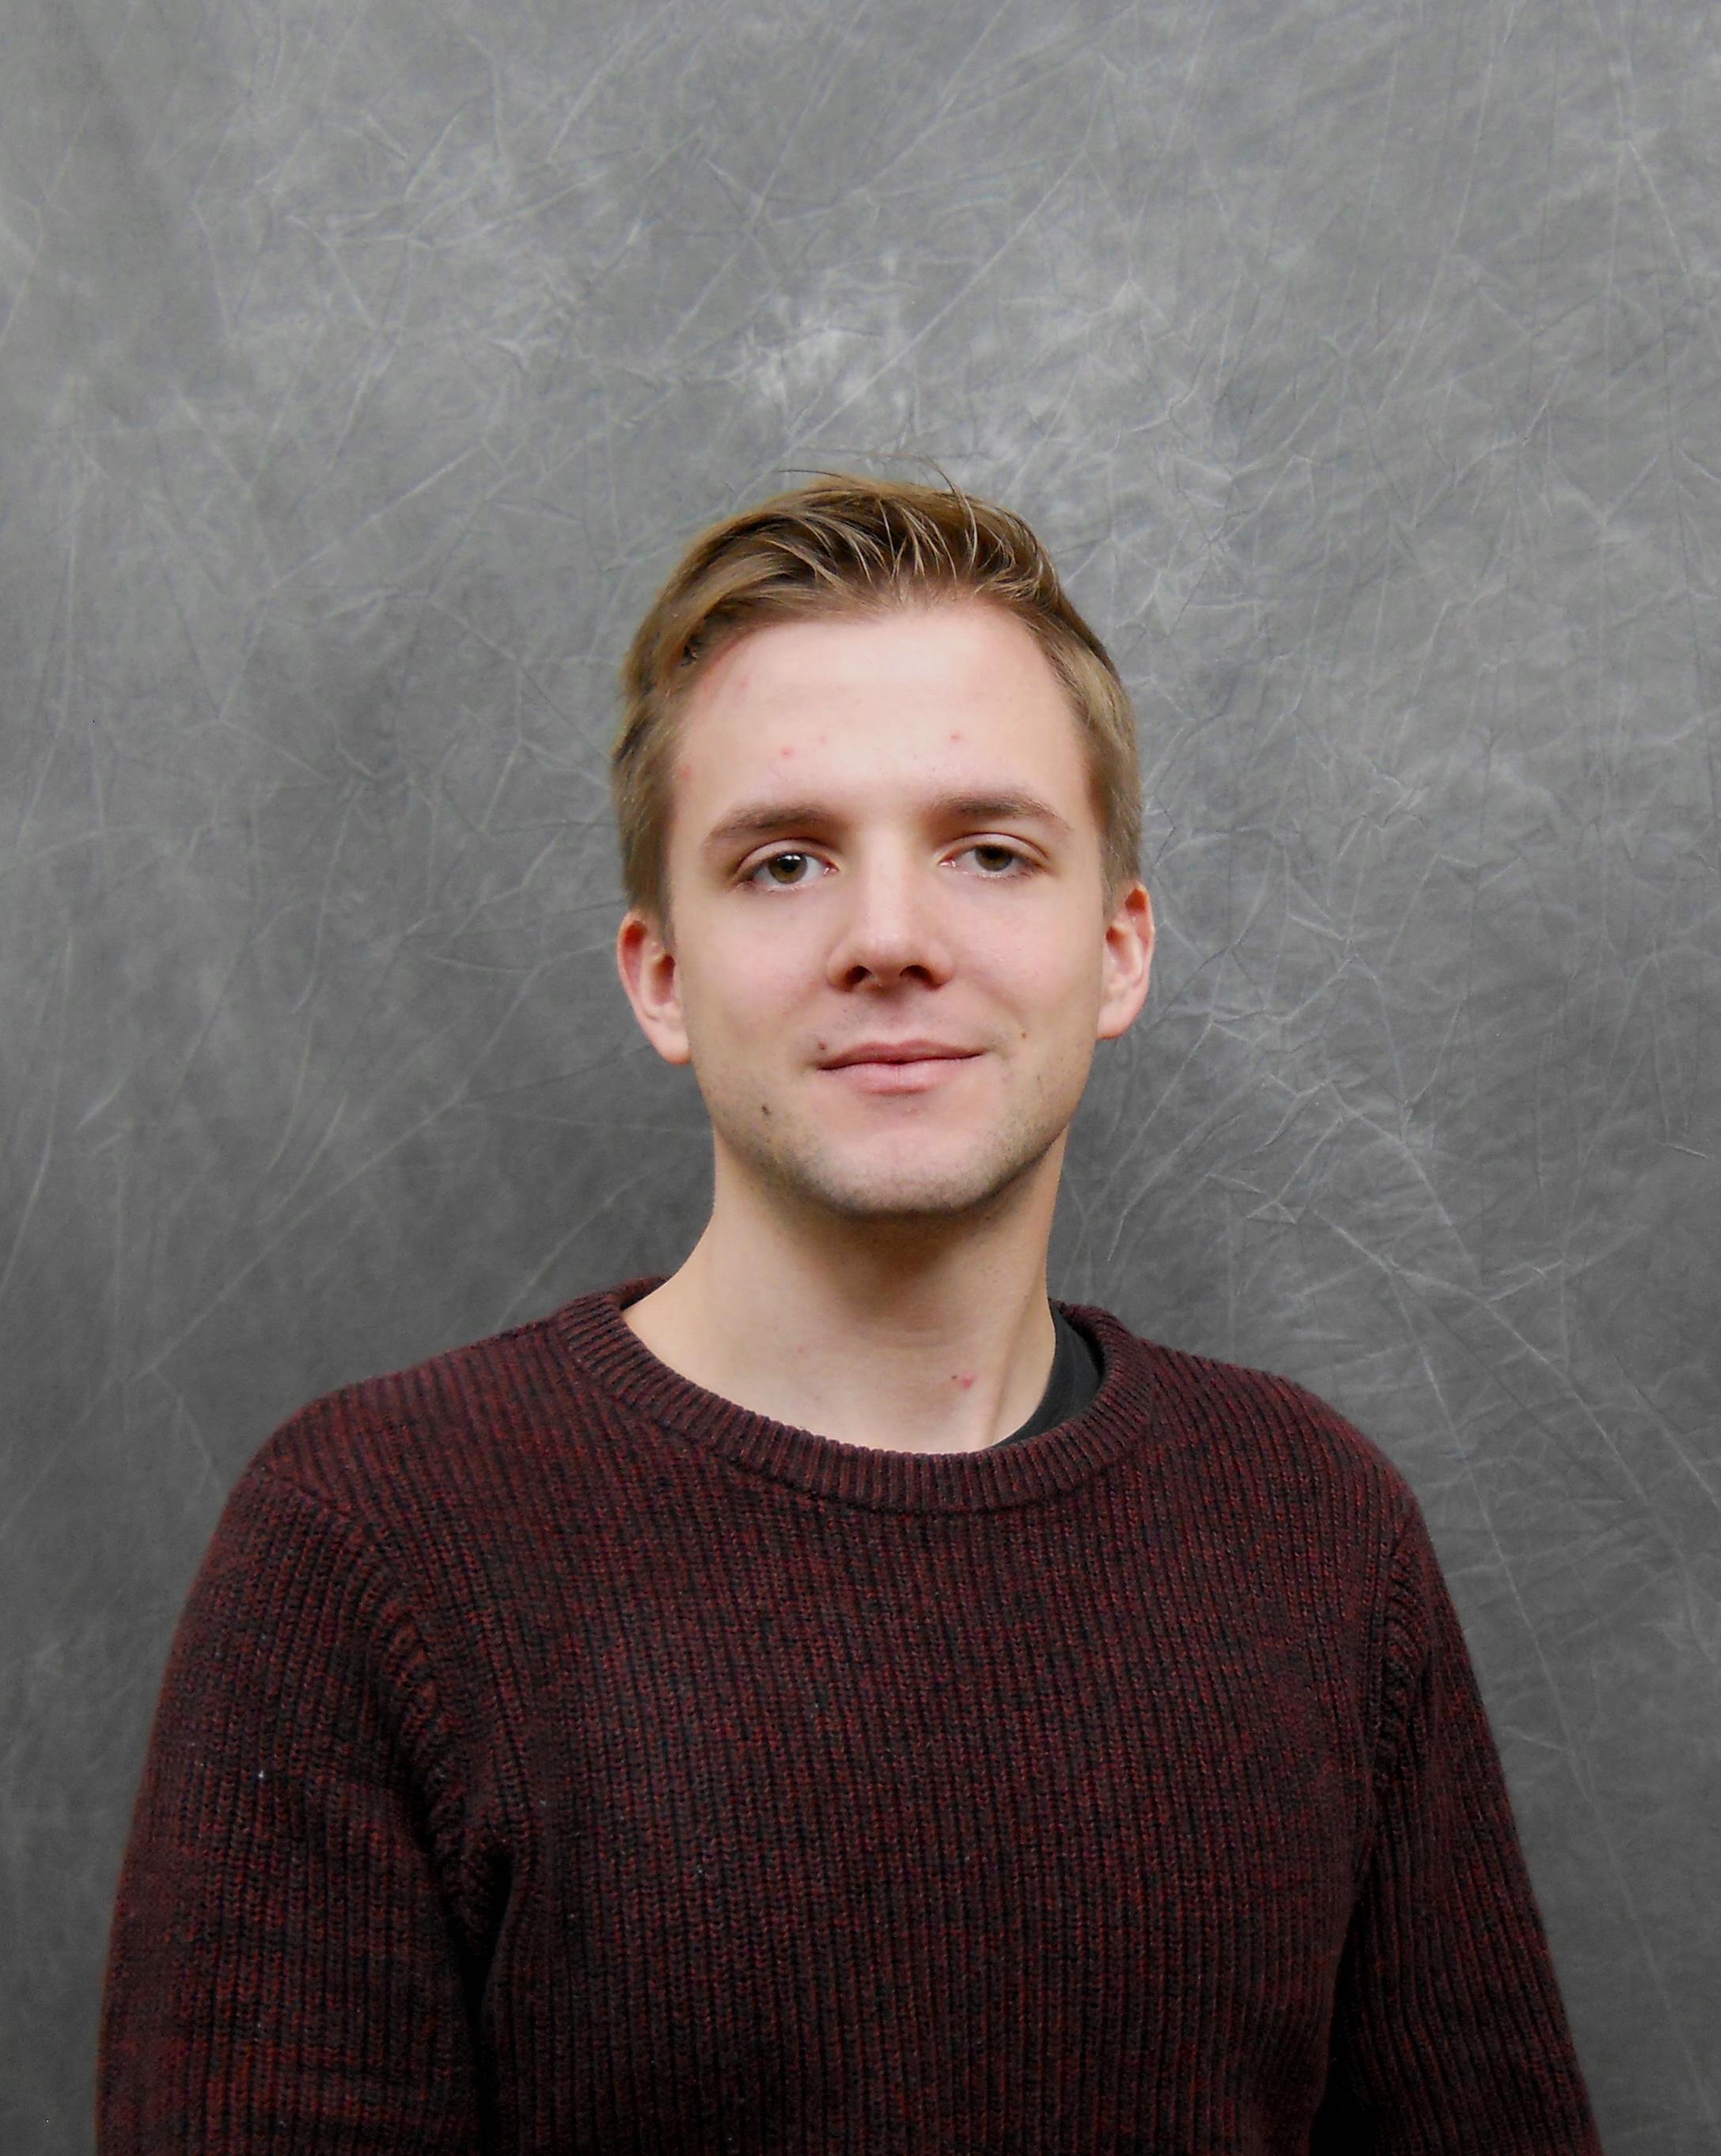 photo of ANDERSON RIORDAN